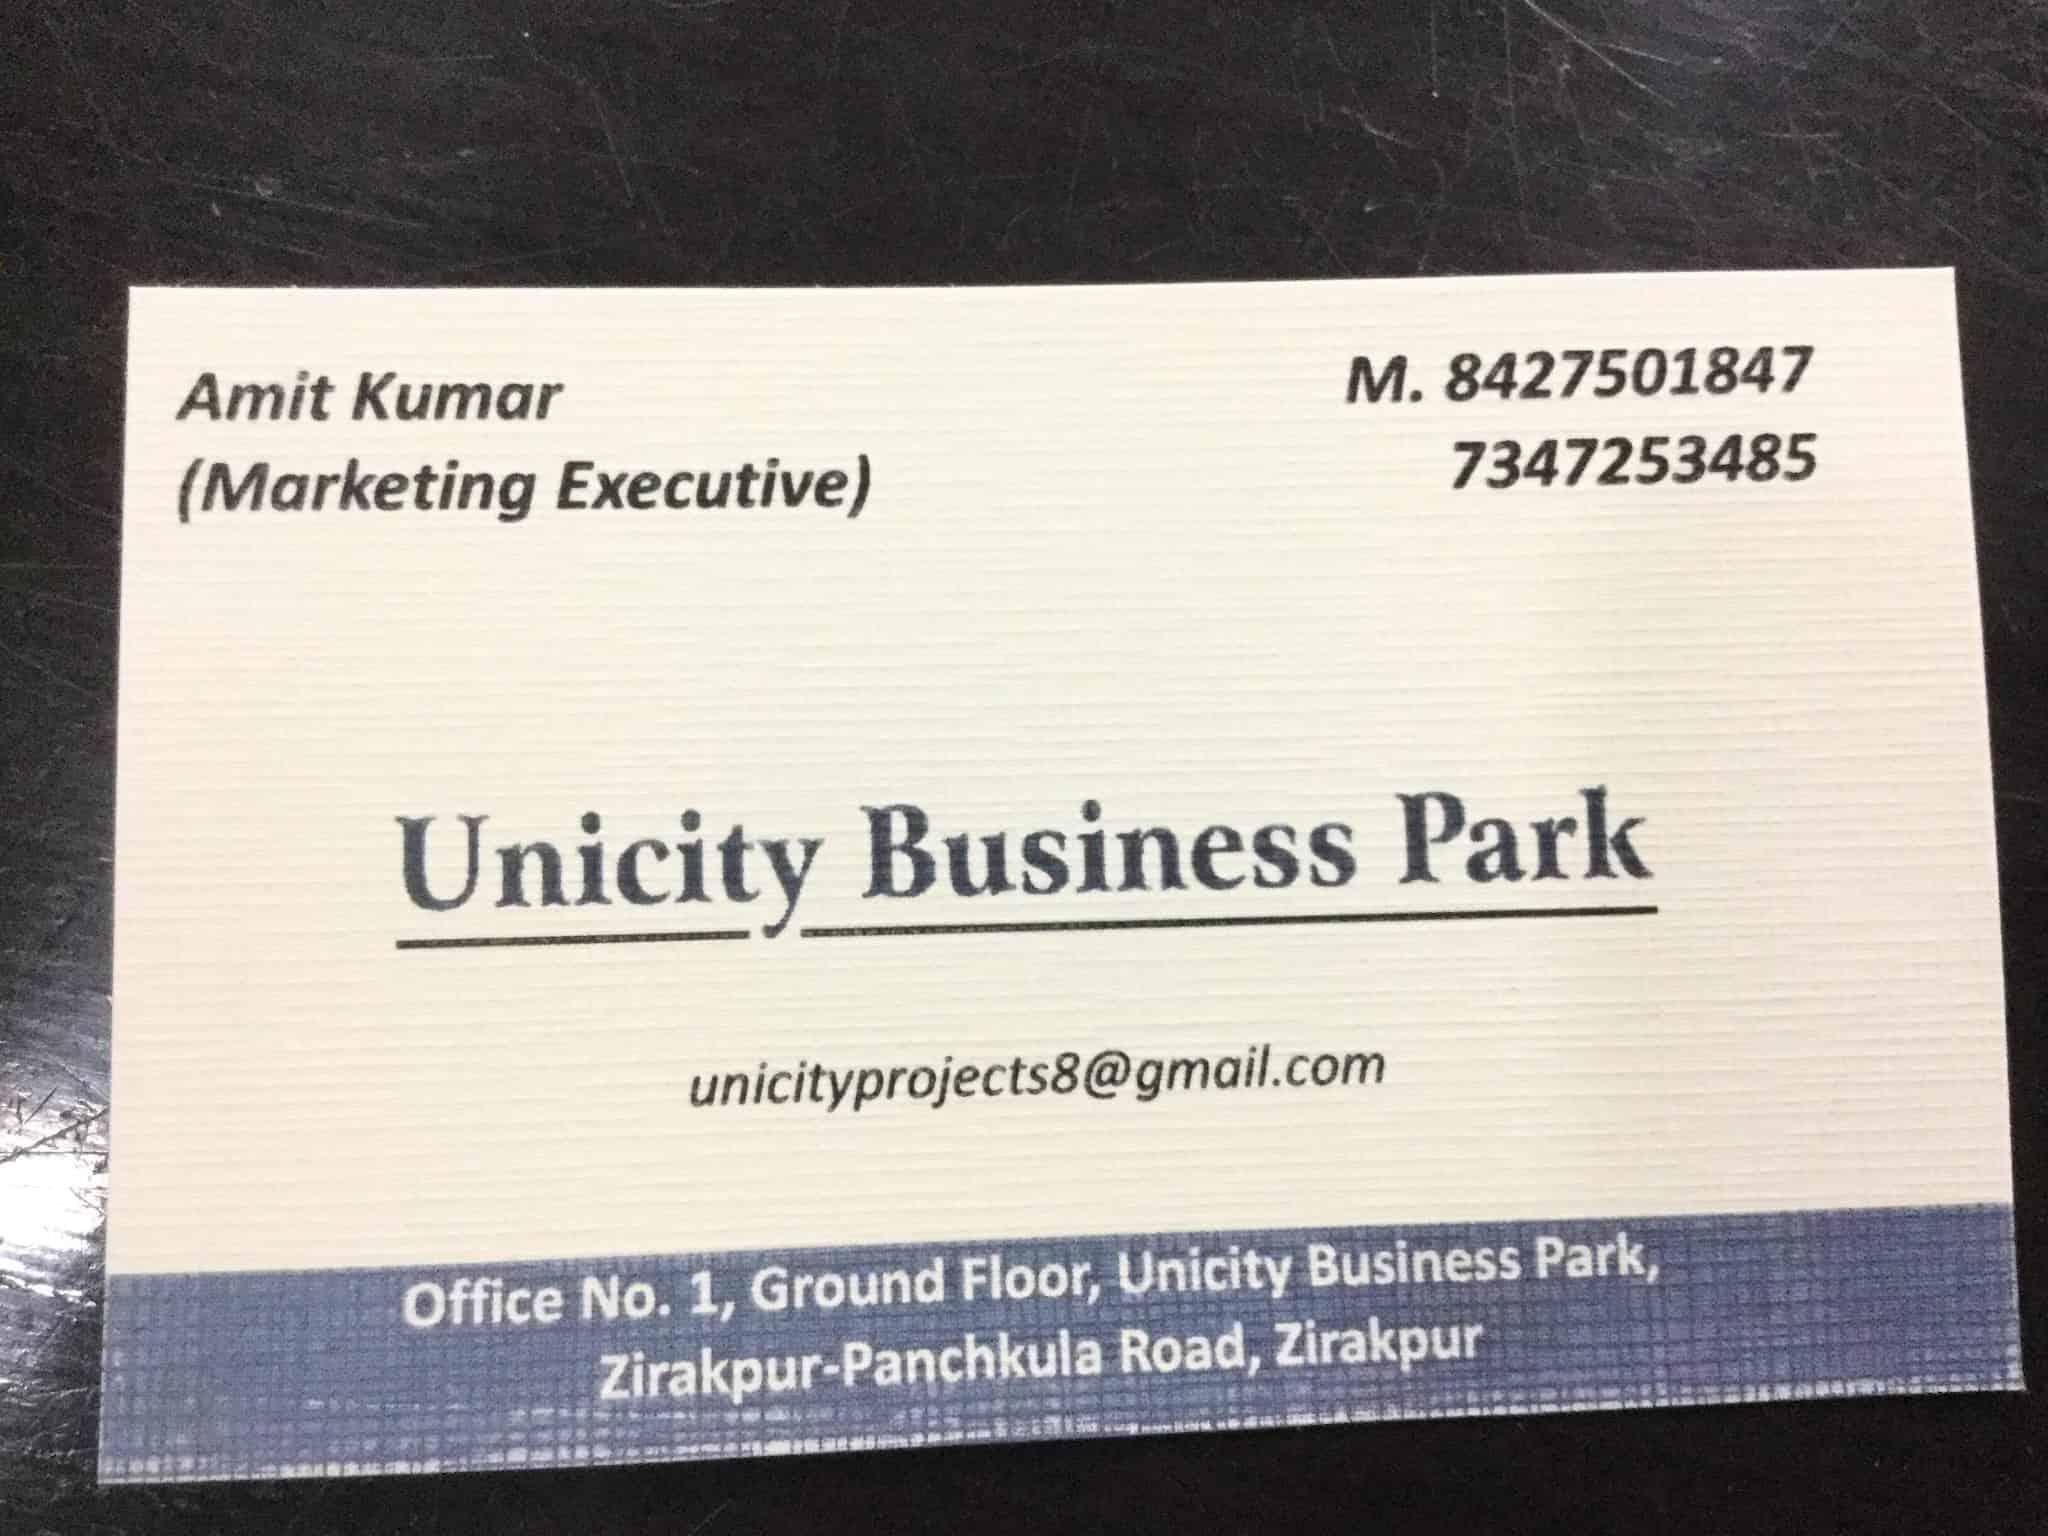 Unicity business park photos chandigarh pictures images visiting card unicity business park photos chandigarh parks colourmoves